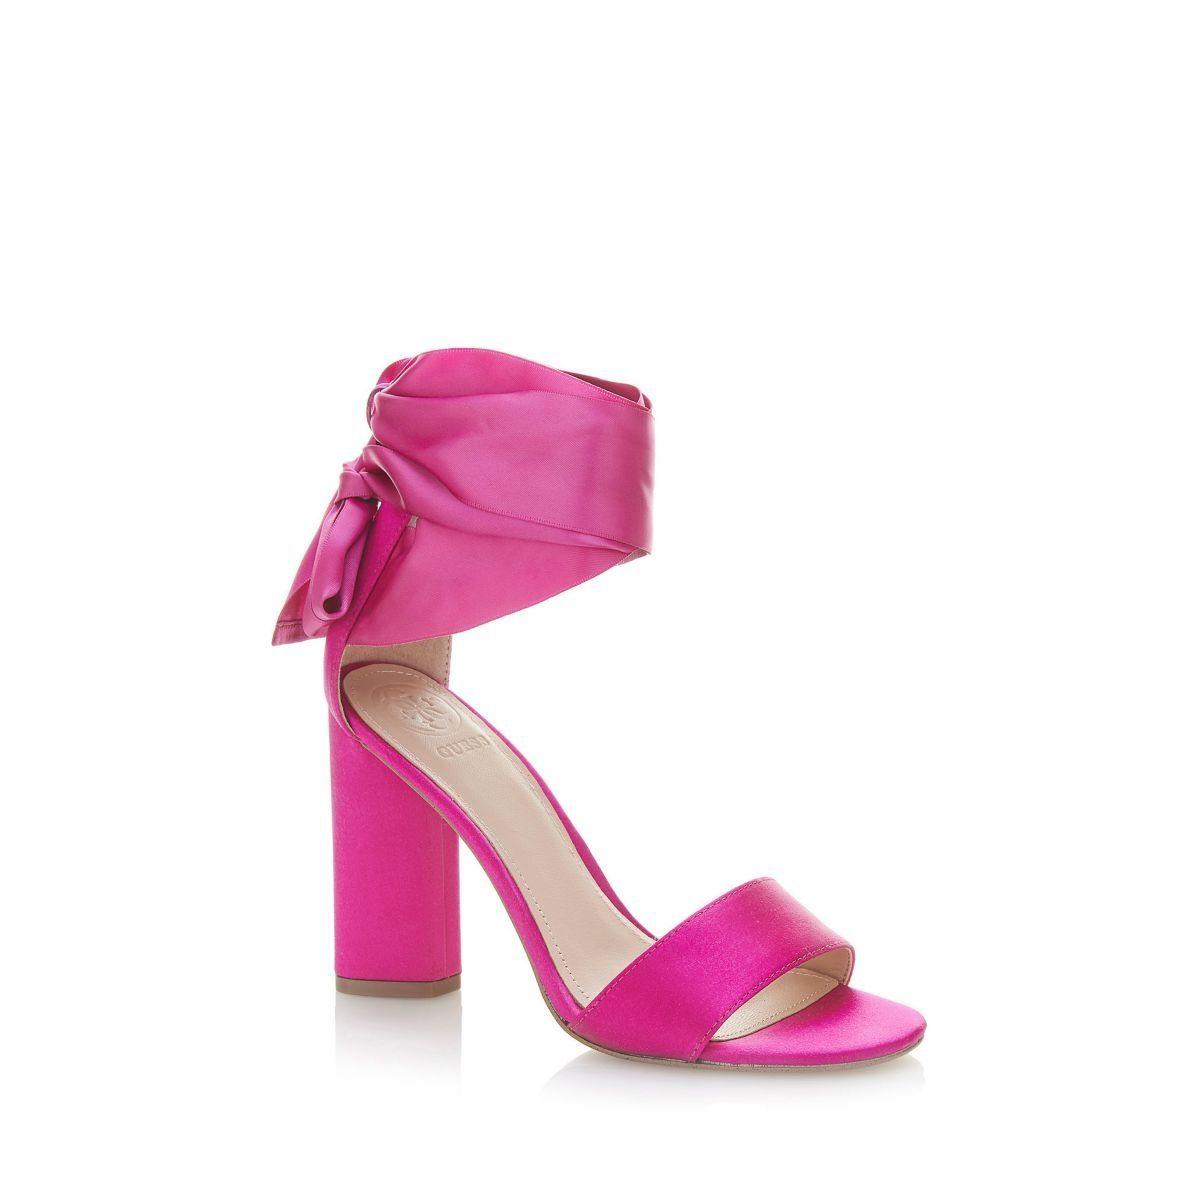 Guess Sandale online kaufen  fuchsia